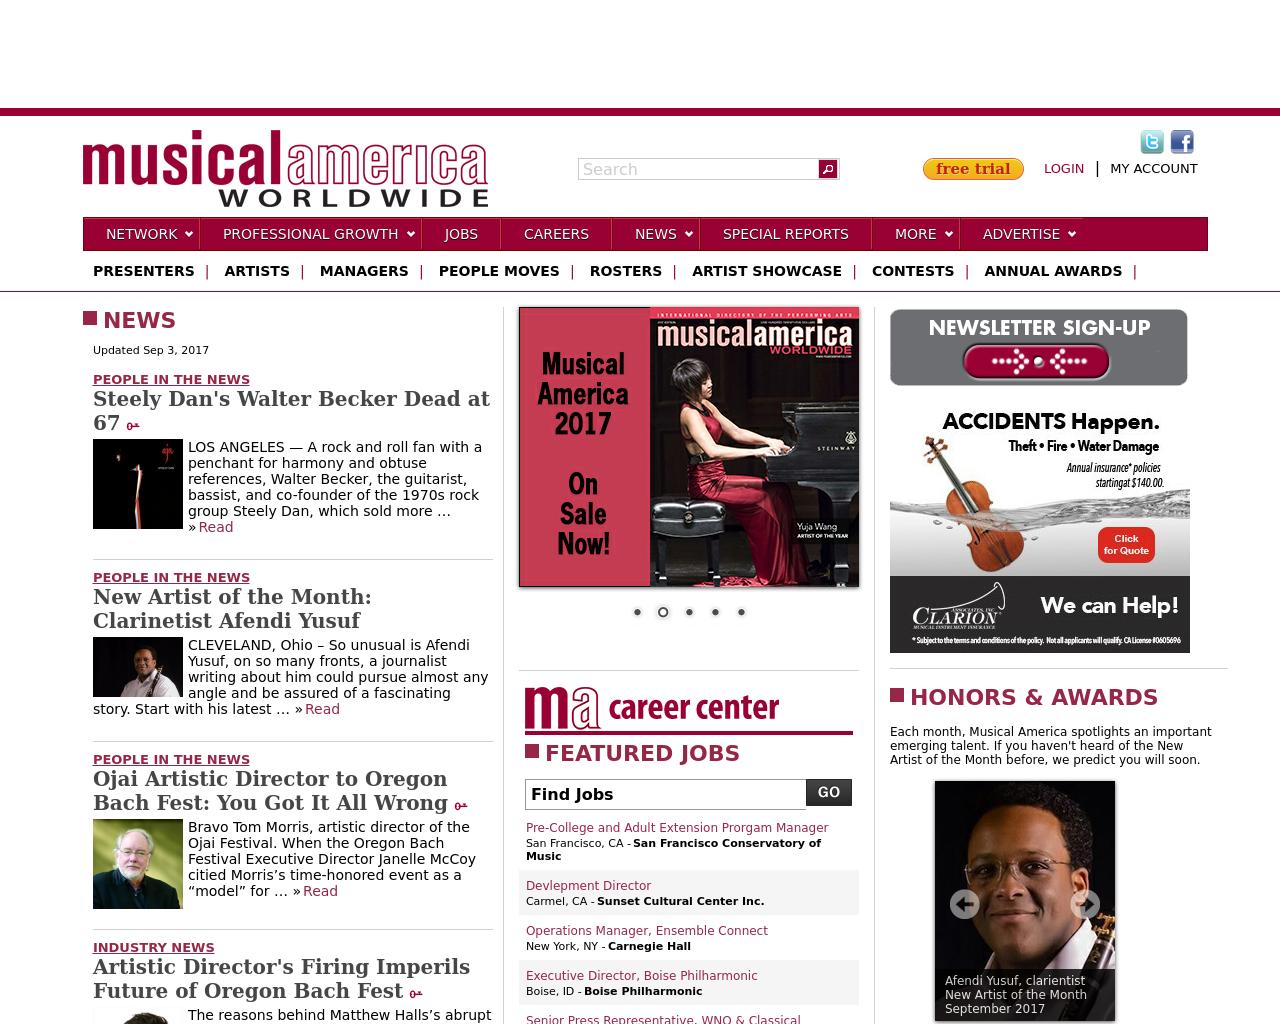 Musical-America-Worldwide-Advertising-Reviews-Pricing